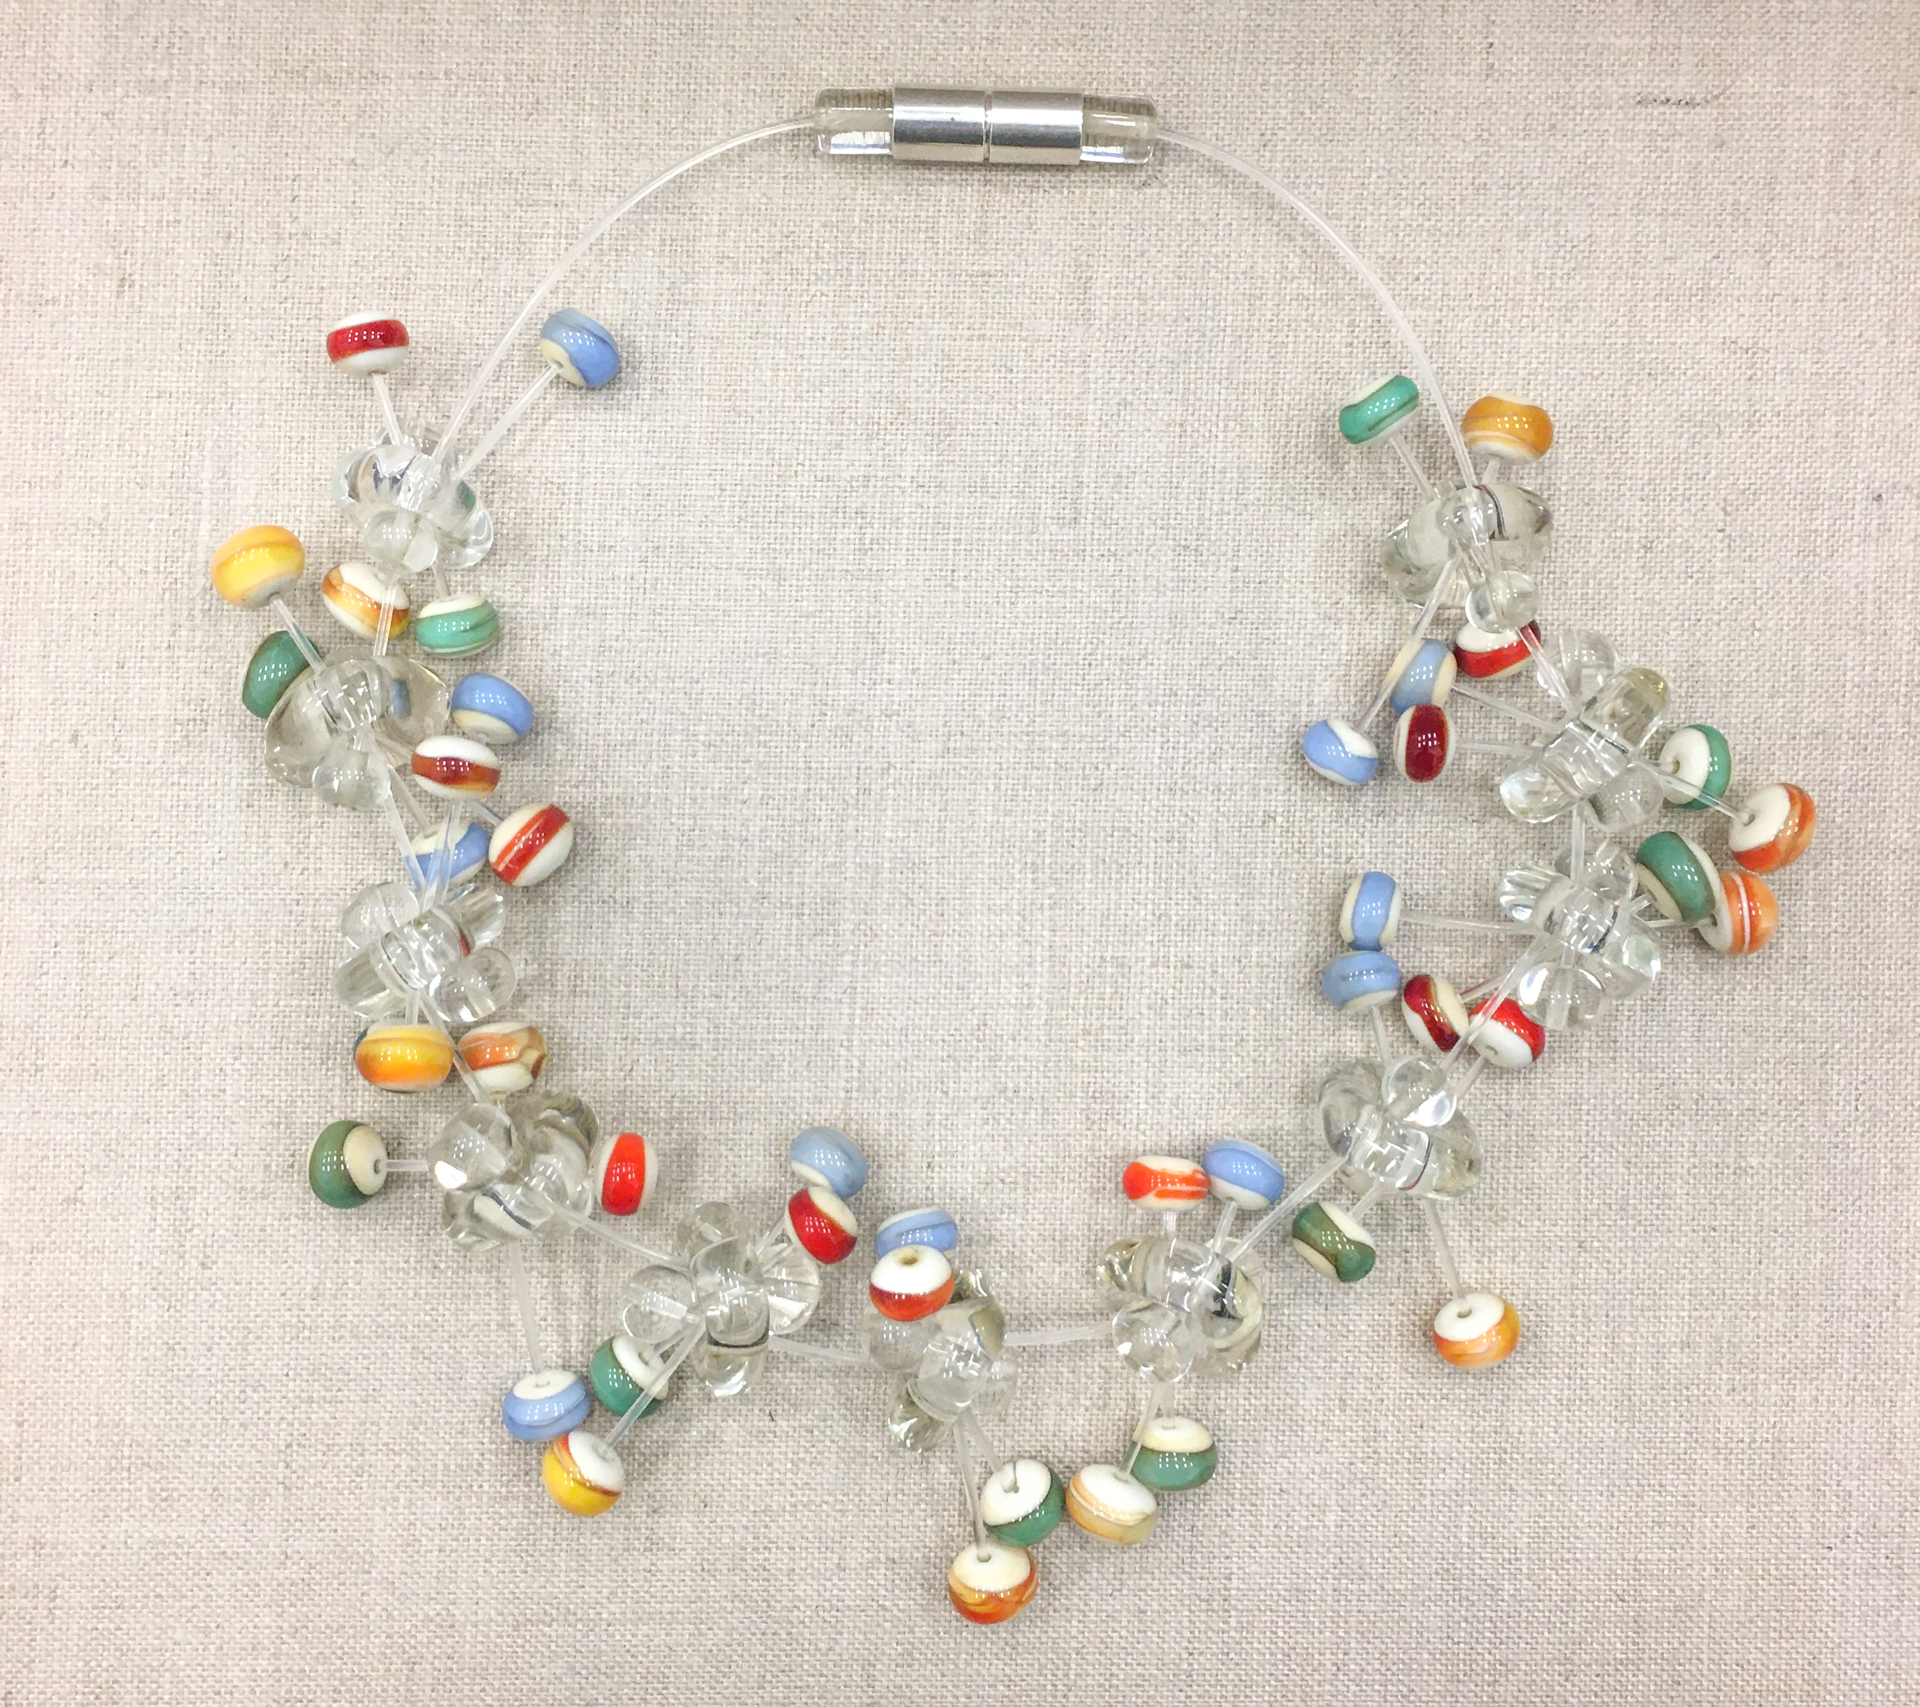 Clasp Necklace No. 6 by Jette Vogt